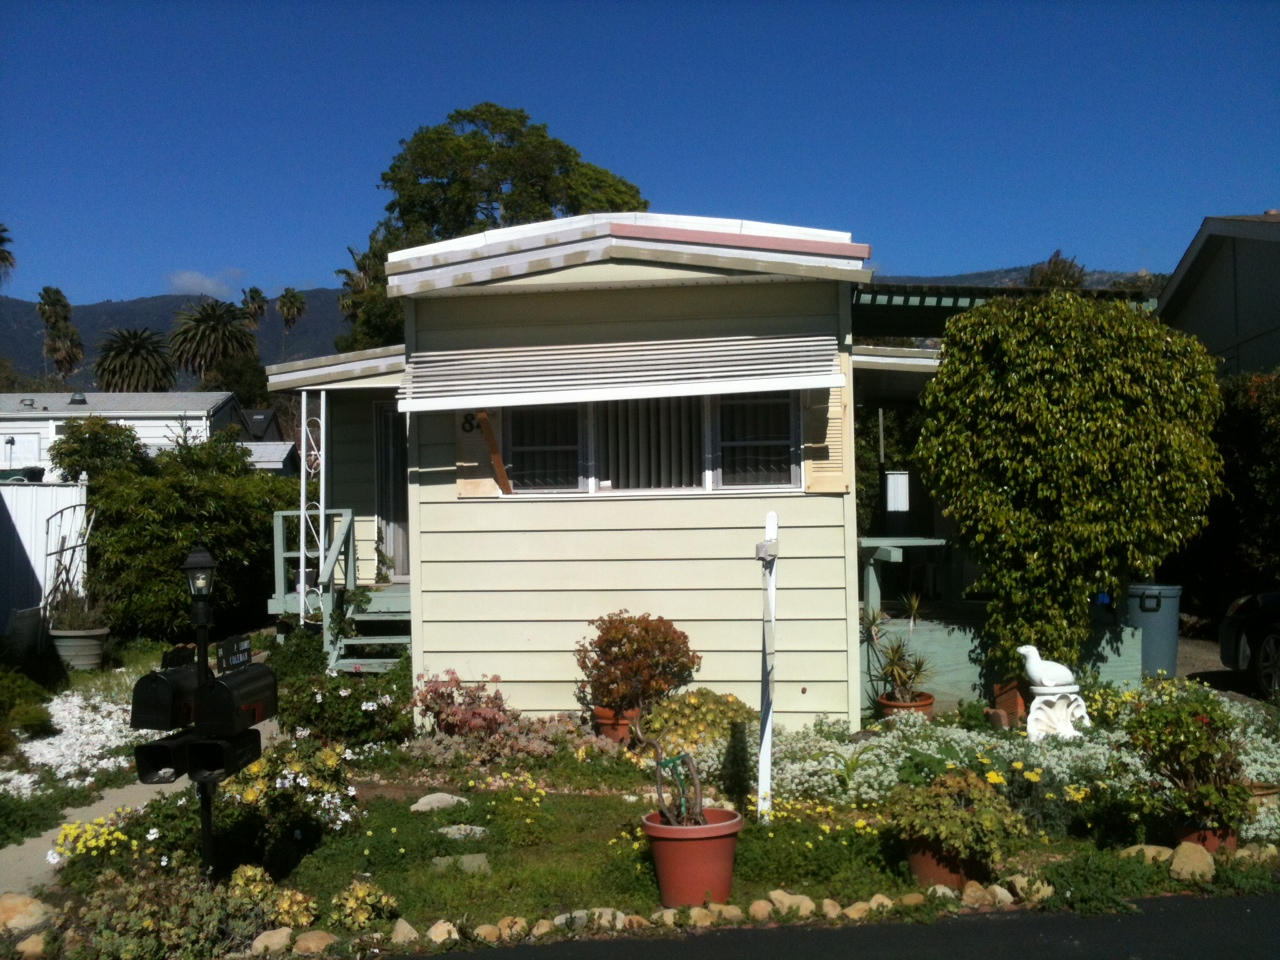 Property photo for 333 Old Mill Rd #84 Santa Barbara, California 93110 - 15-481